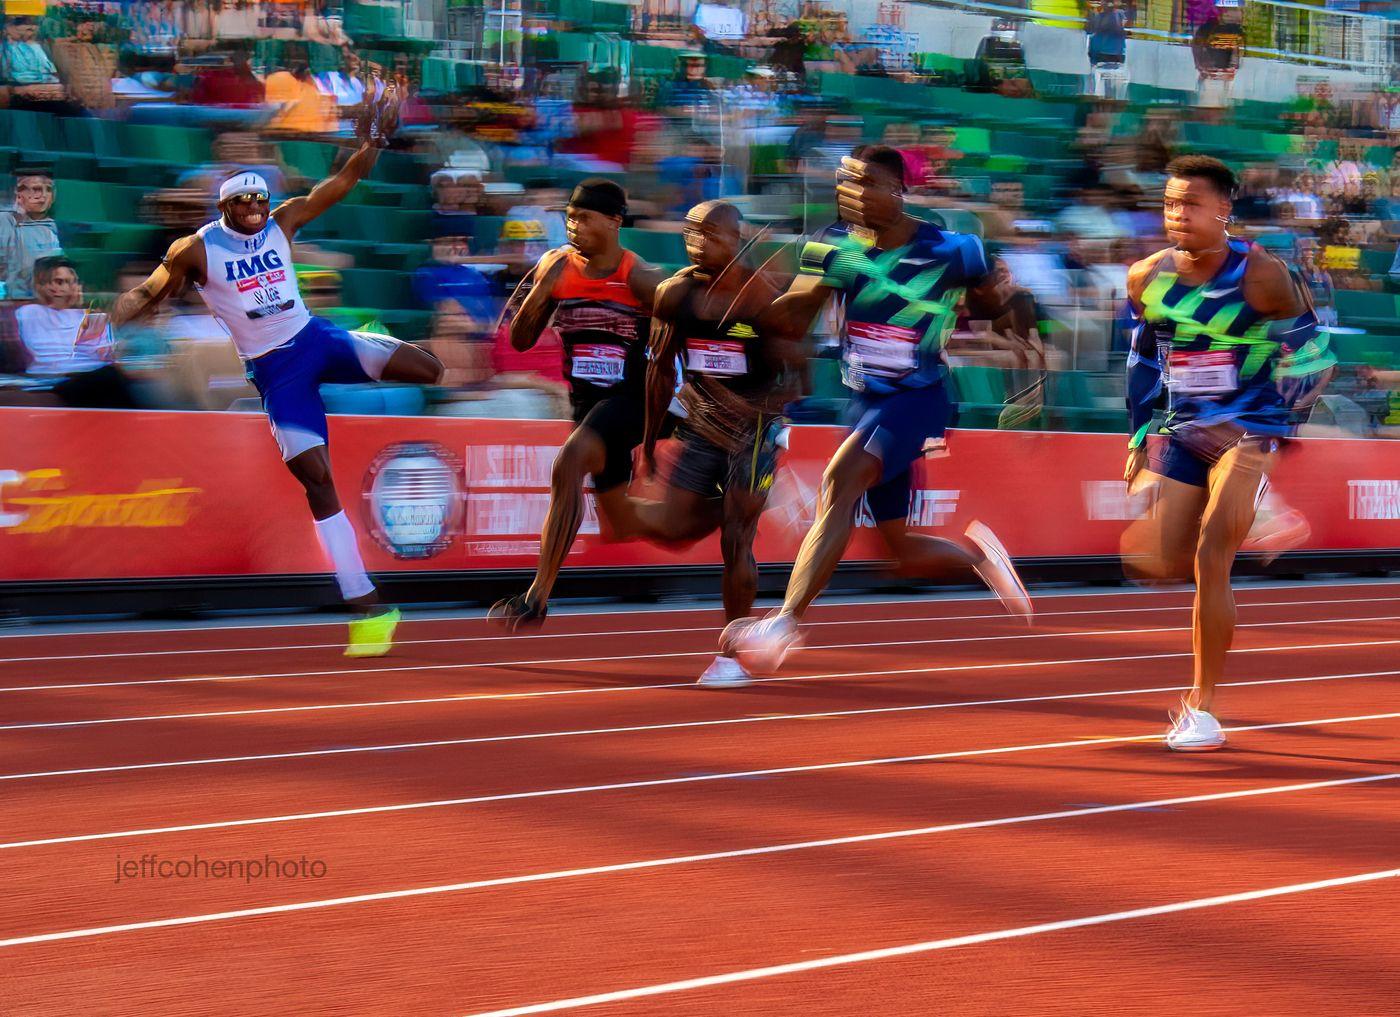 slade-100m-2021-US-Oly-Trials-day-2-3021-jeff-cohen-photo--web.jpg